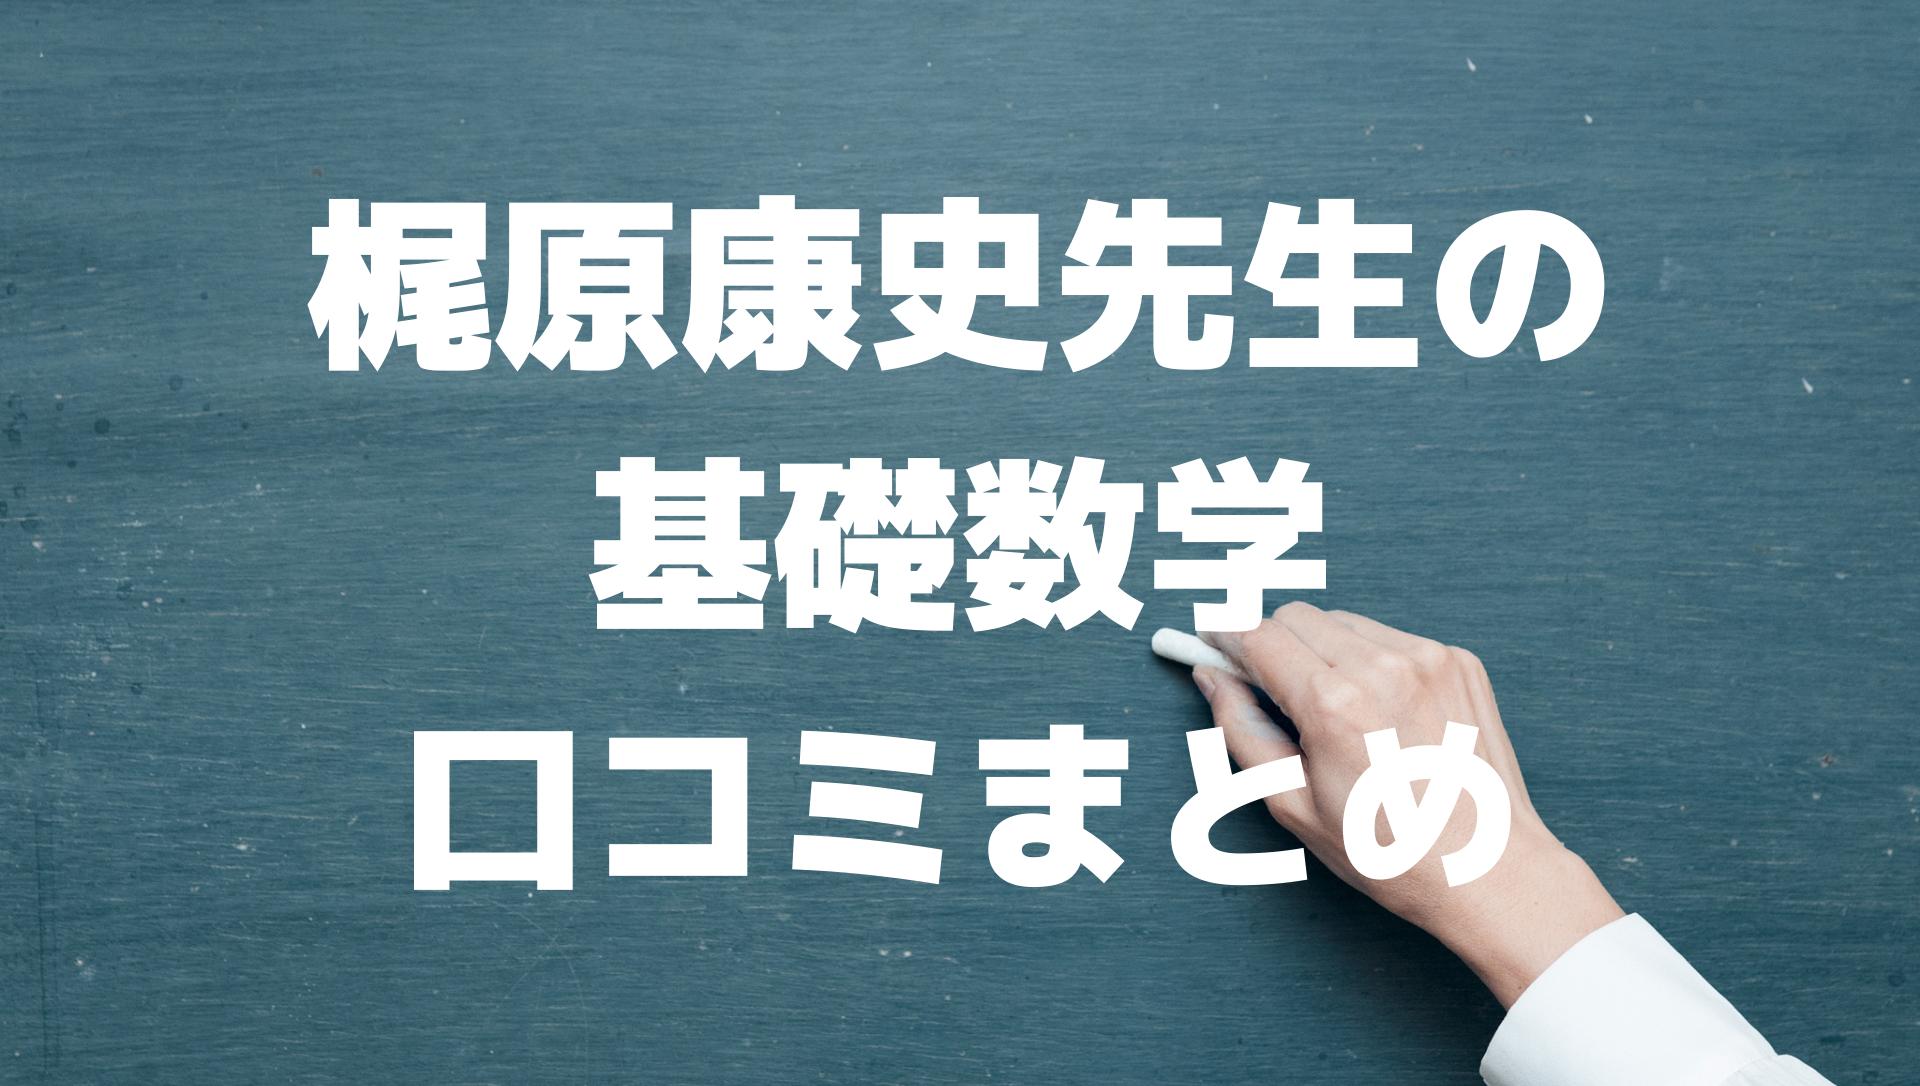 梶原康史先生の基礎数学